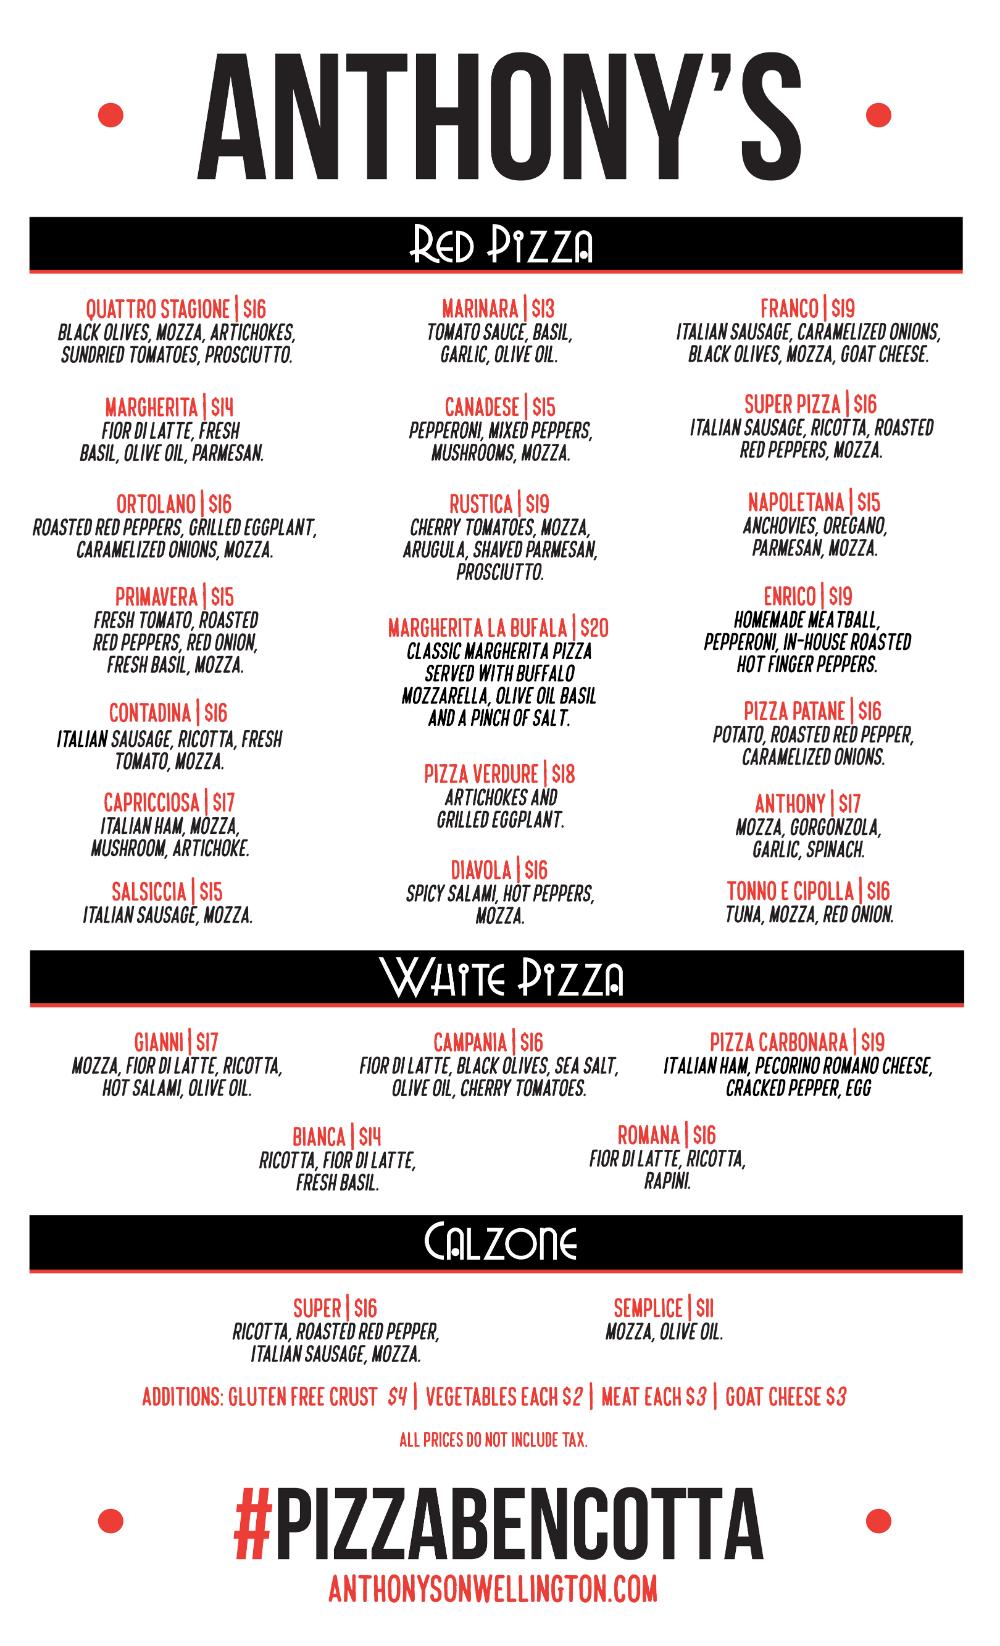 Pin By Stephanie Savard On Ottawa Yeah Anthonys Pizza Food Network Recipes Ottawa